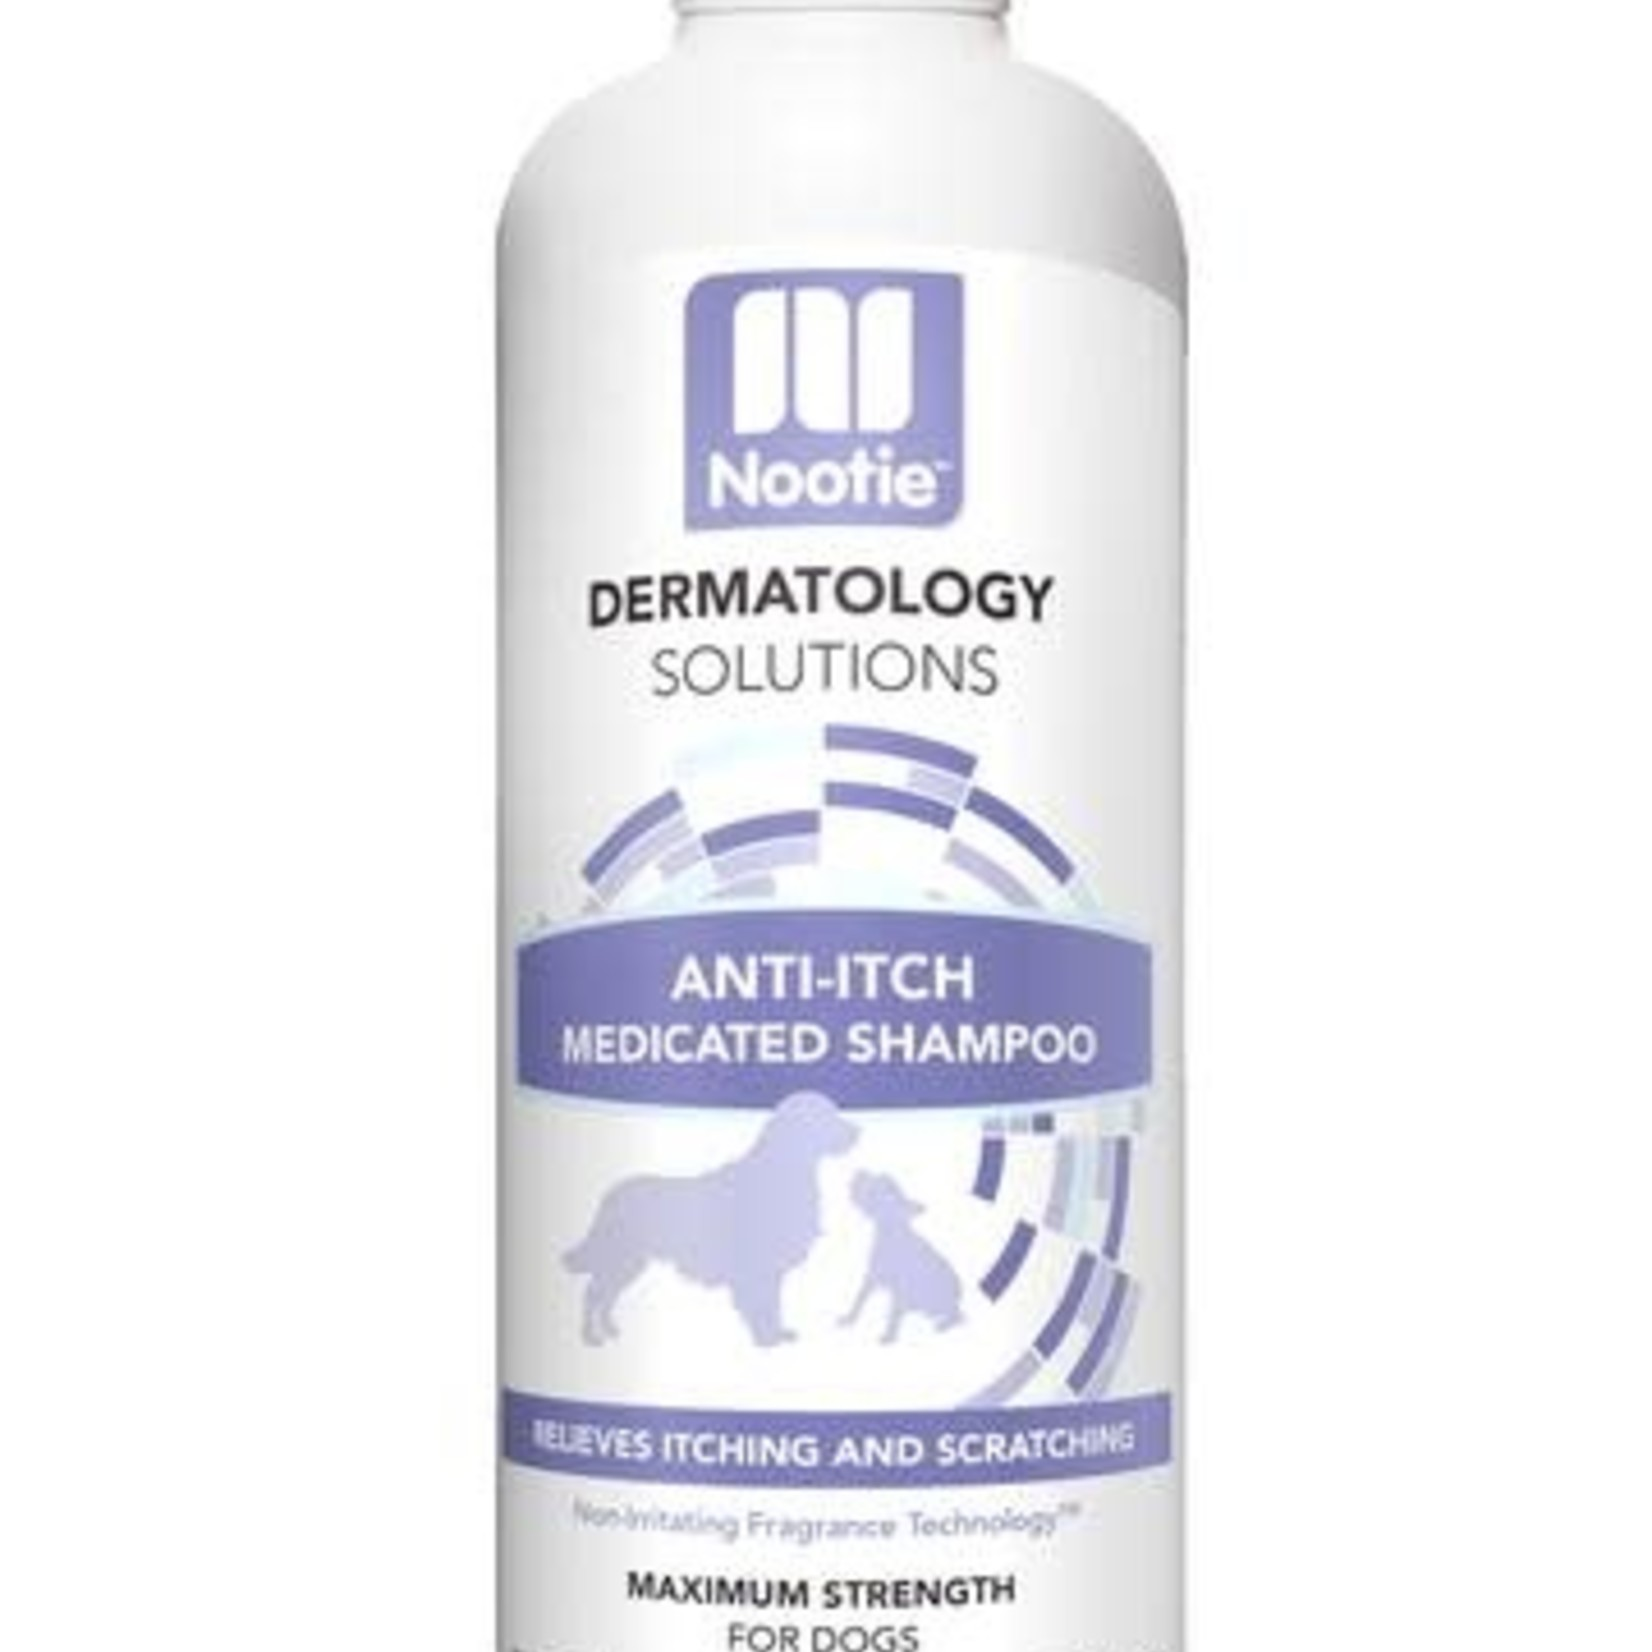 Nootie Anti-Itch Medicated Shampoo 8 OZ